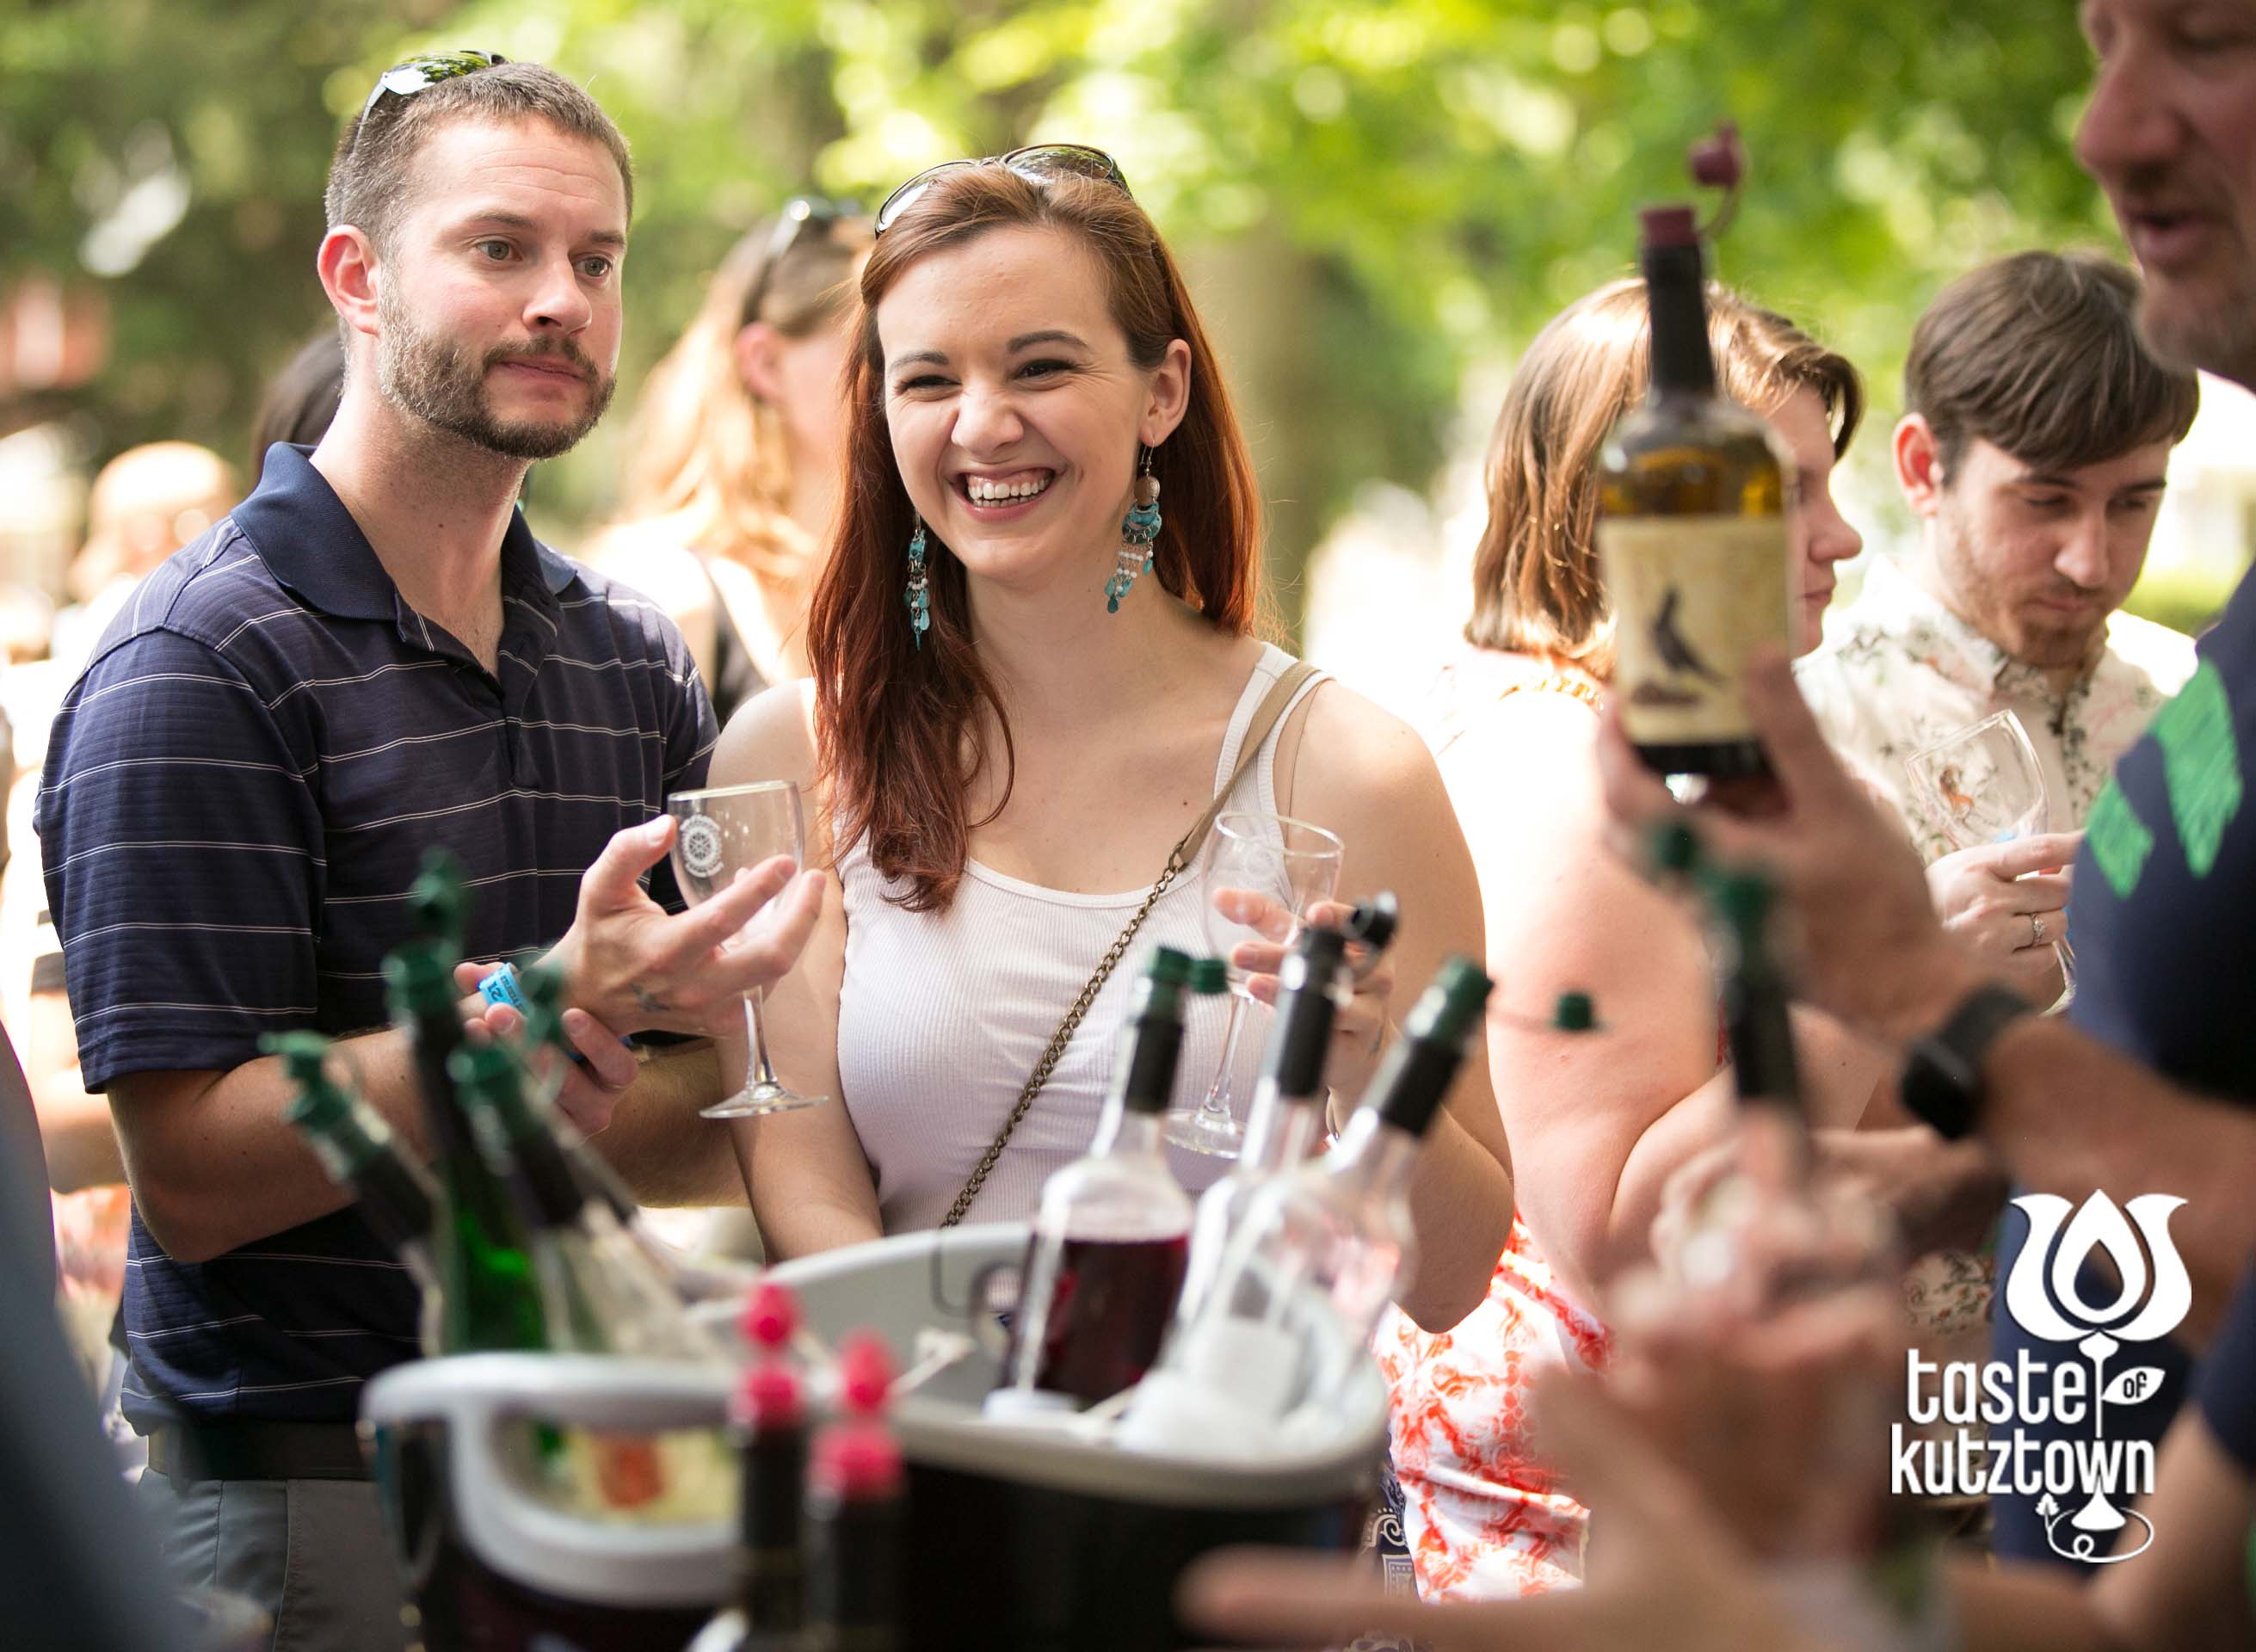 Couple wine tasting at the Taste of Kutztown Wine & Beer Festival